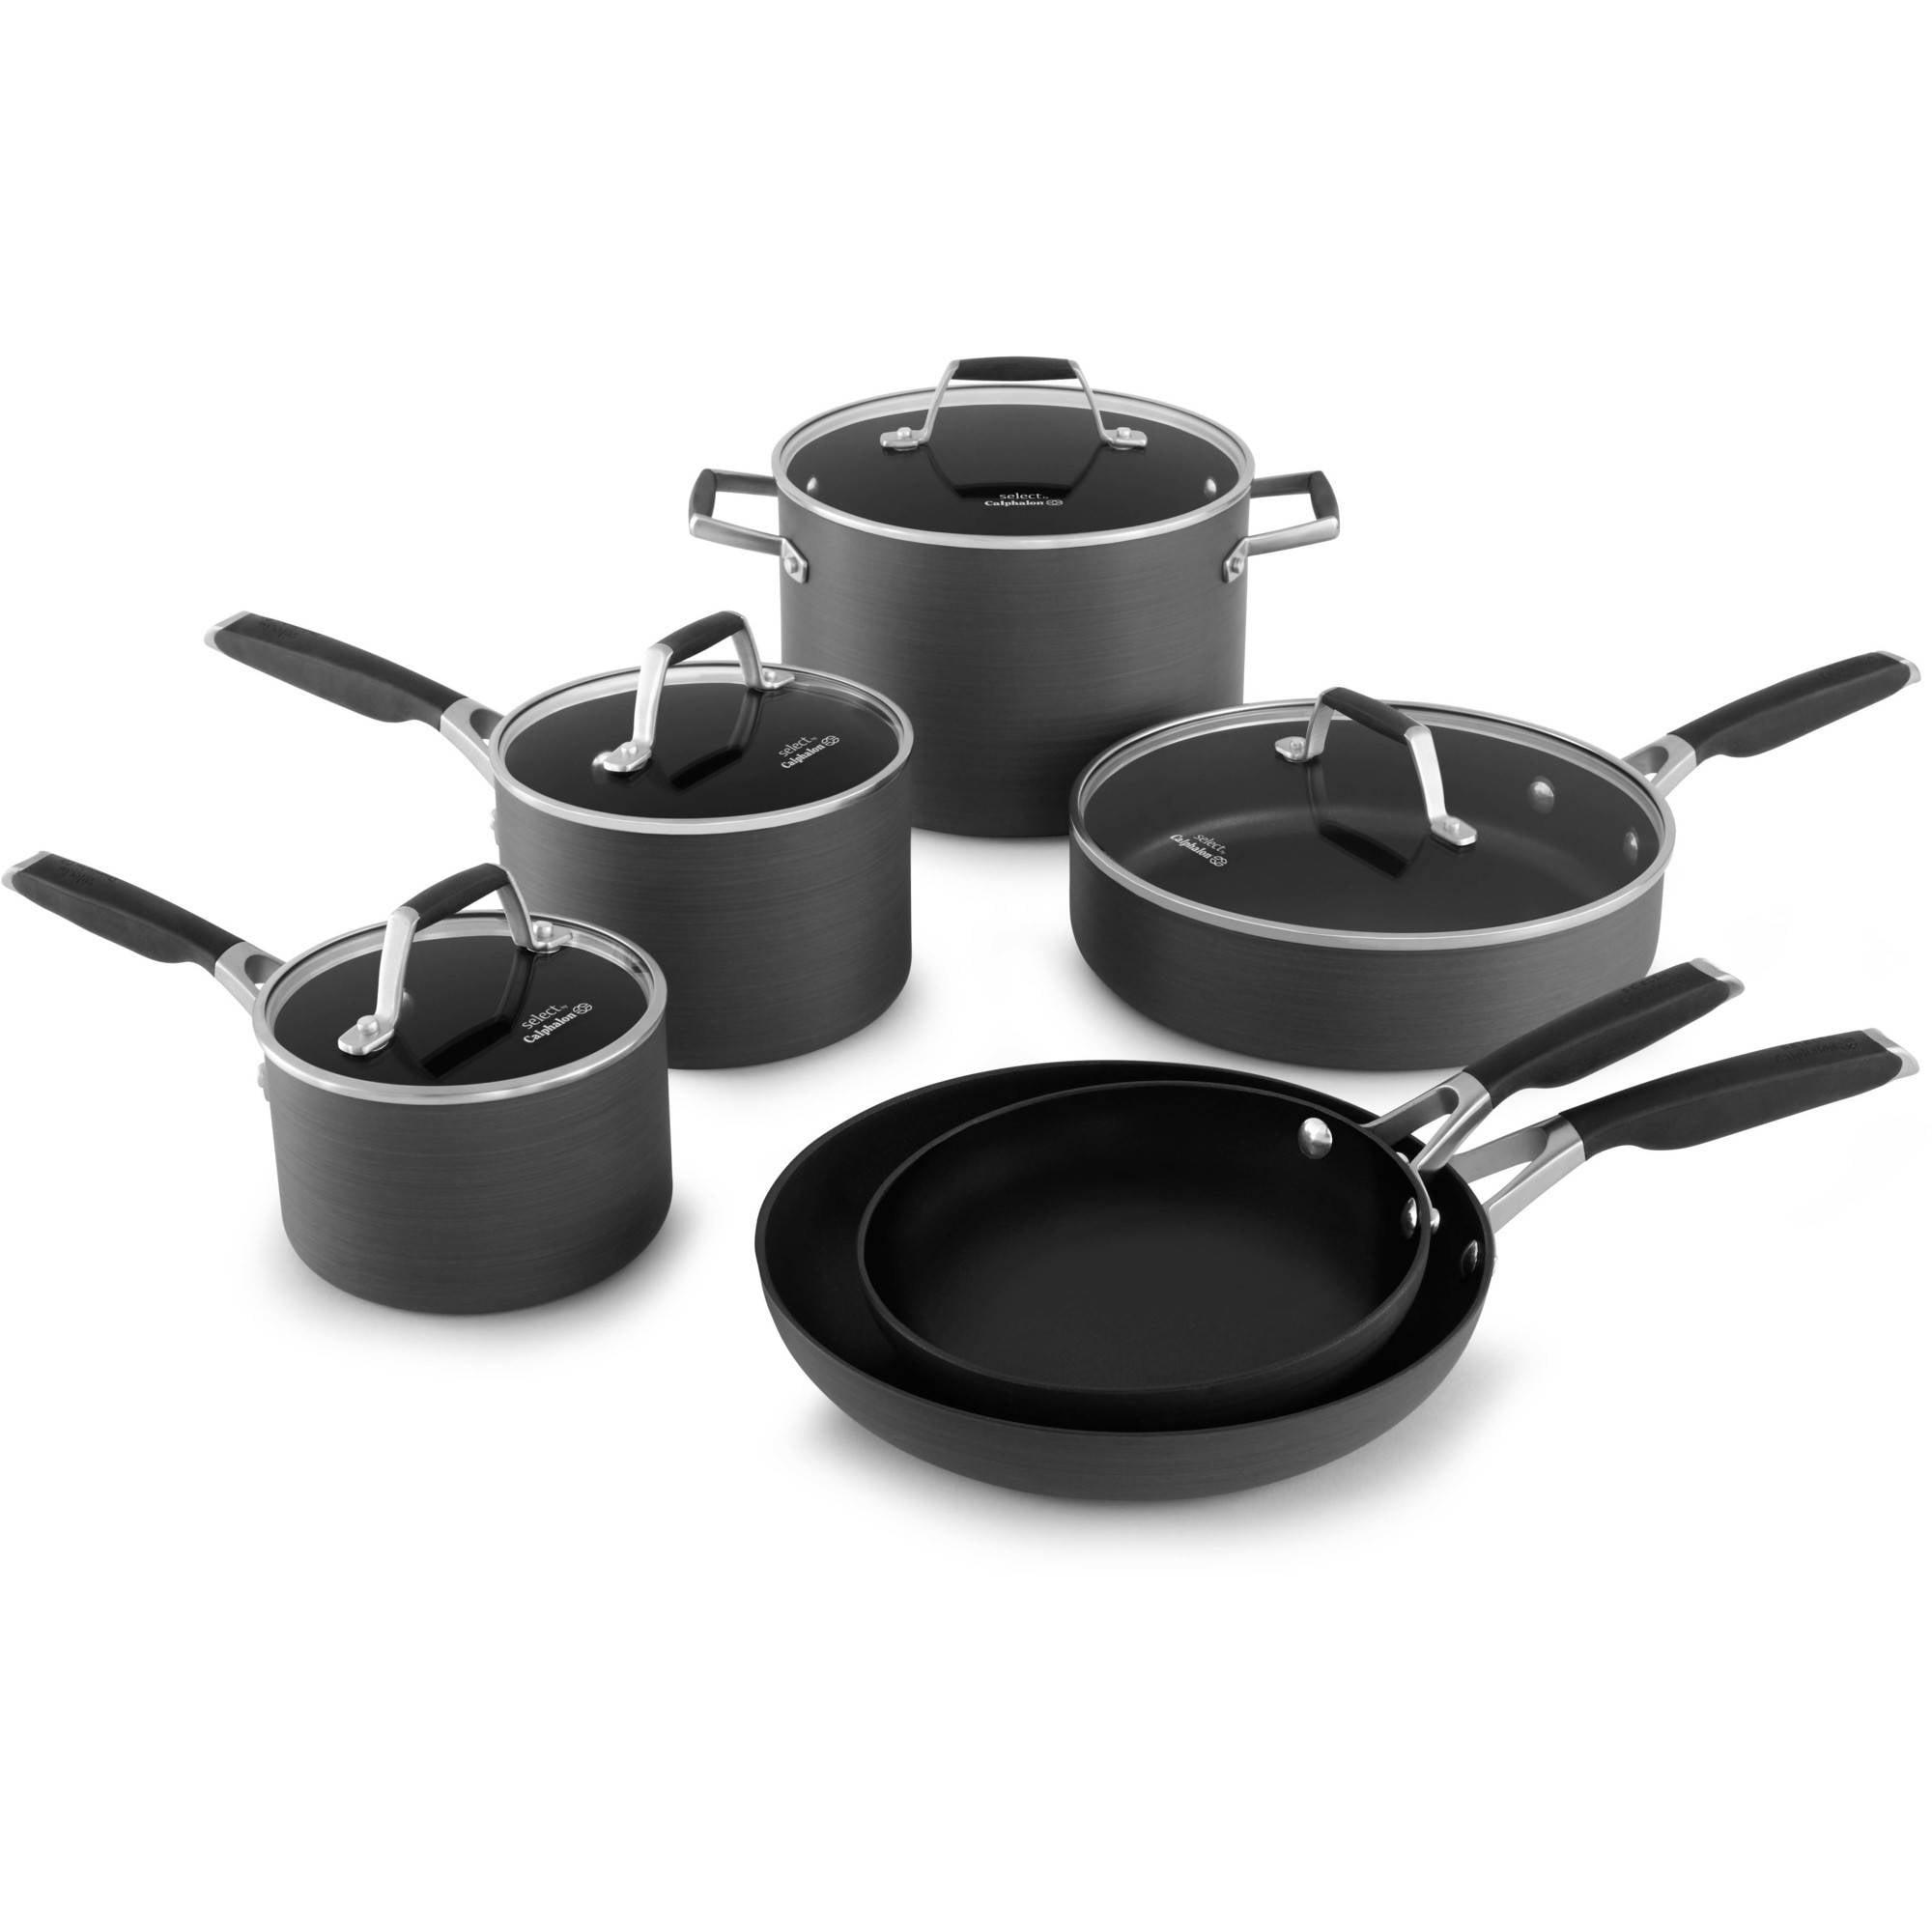 select by calphalon nonstick 10piece cookware set walmartcom - Calphalon Reviews